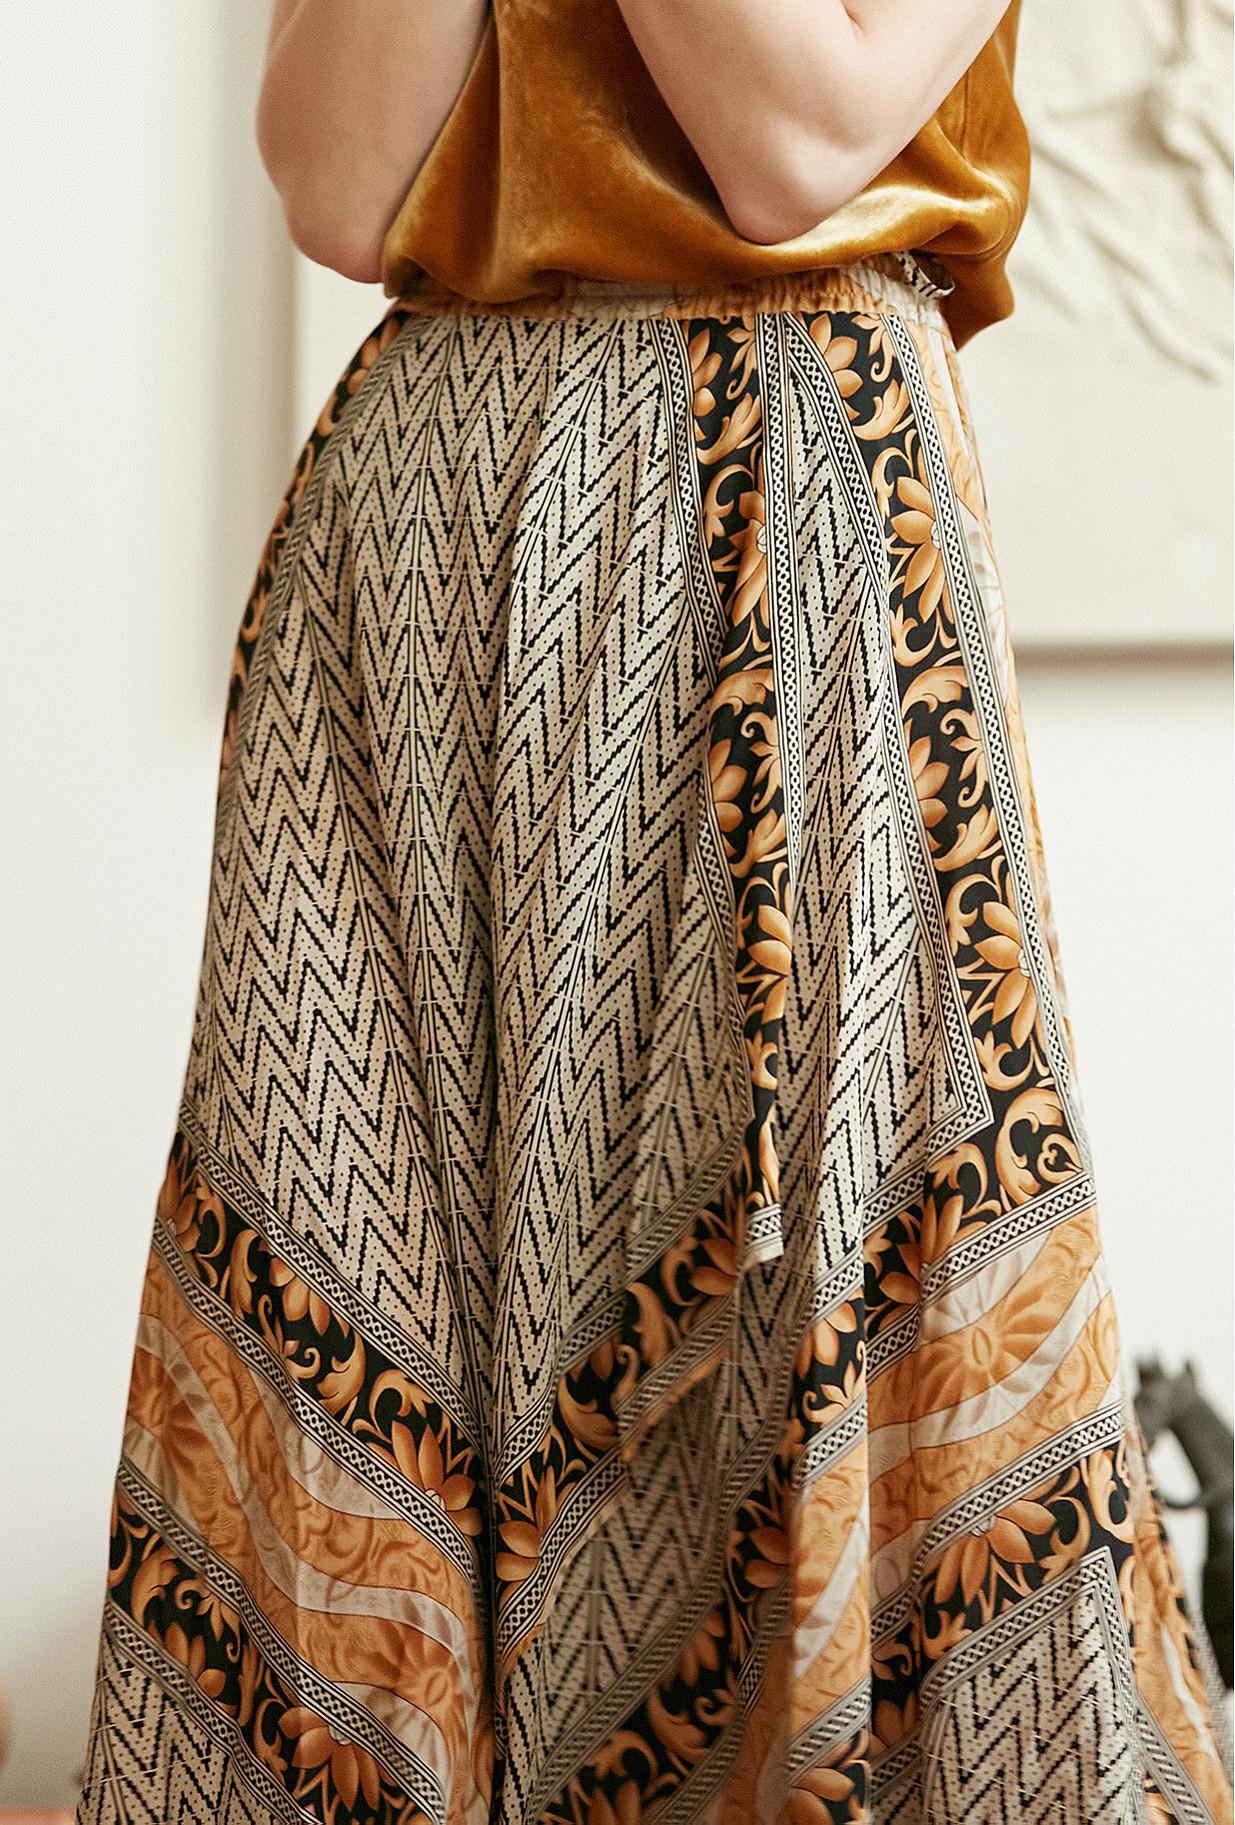 Gold print Skirt Shorebreak Mes Demoiselles Paris